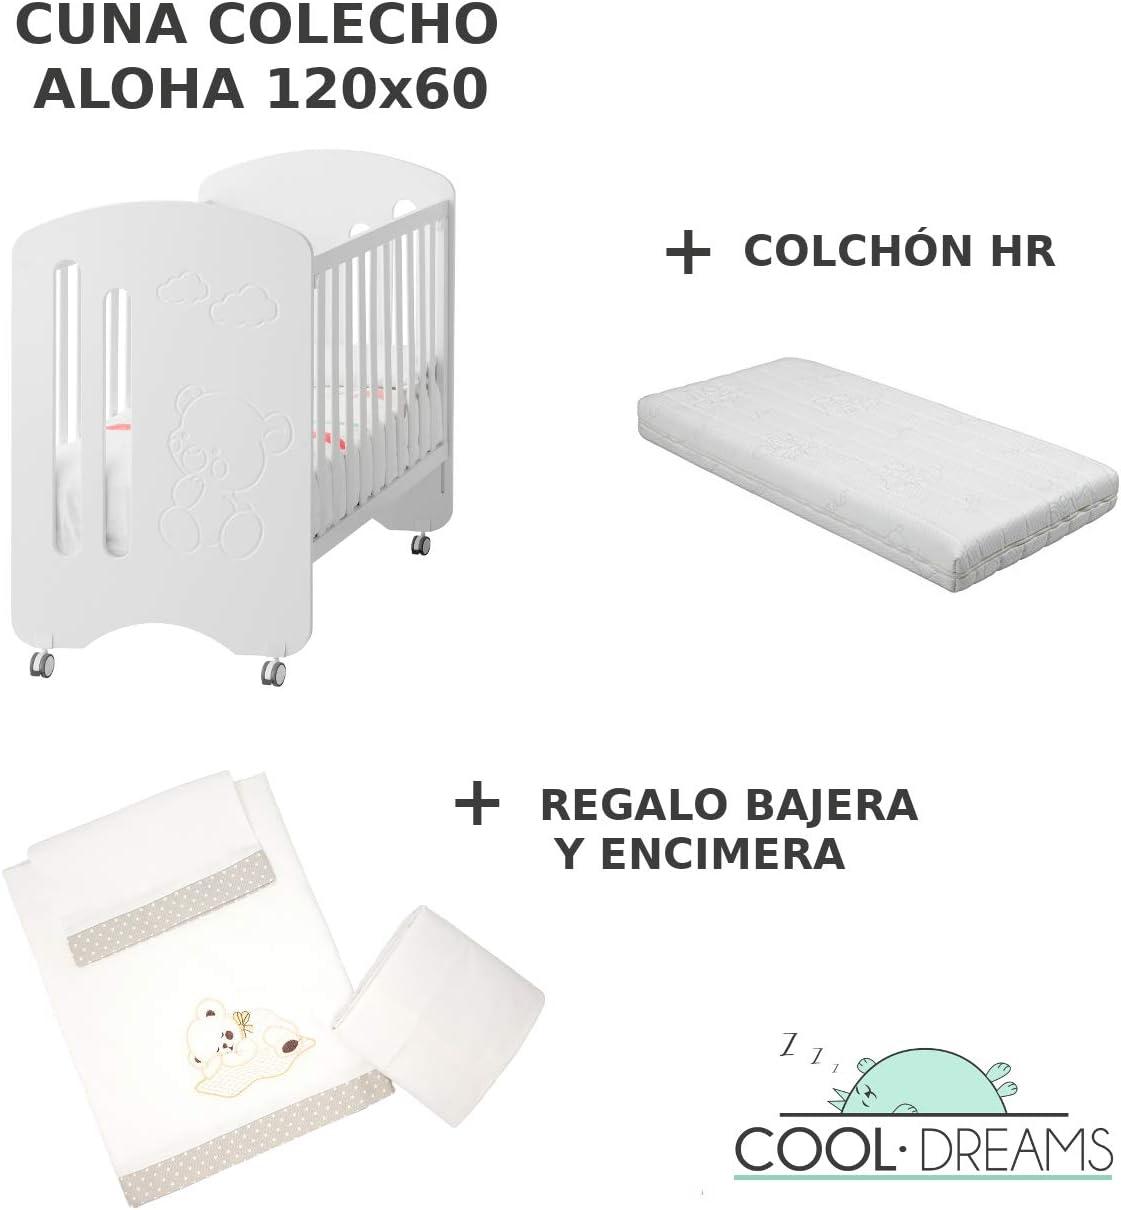 Ruedas Colch/ón HR Cuna colecho de bebe Aloha Kit colecho incluido